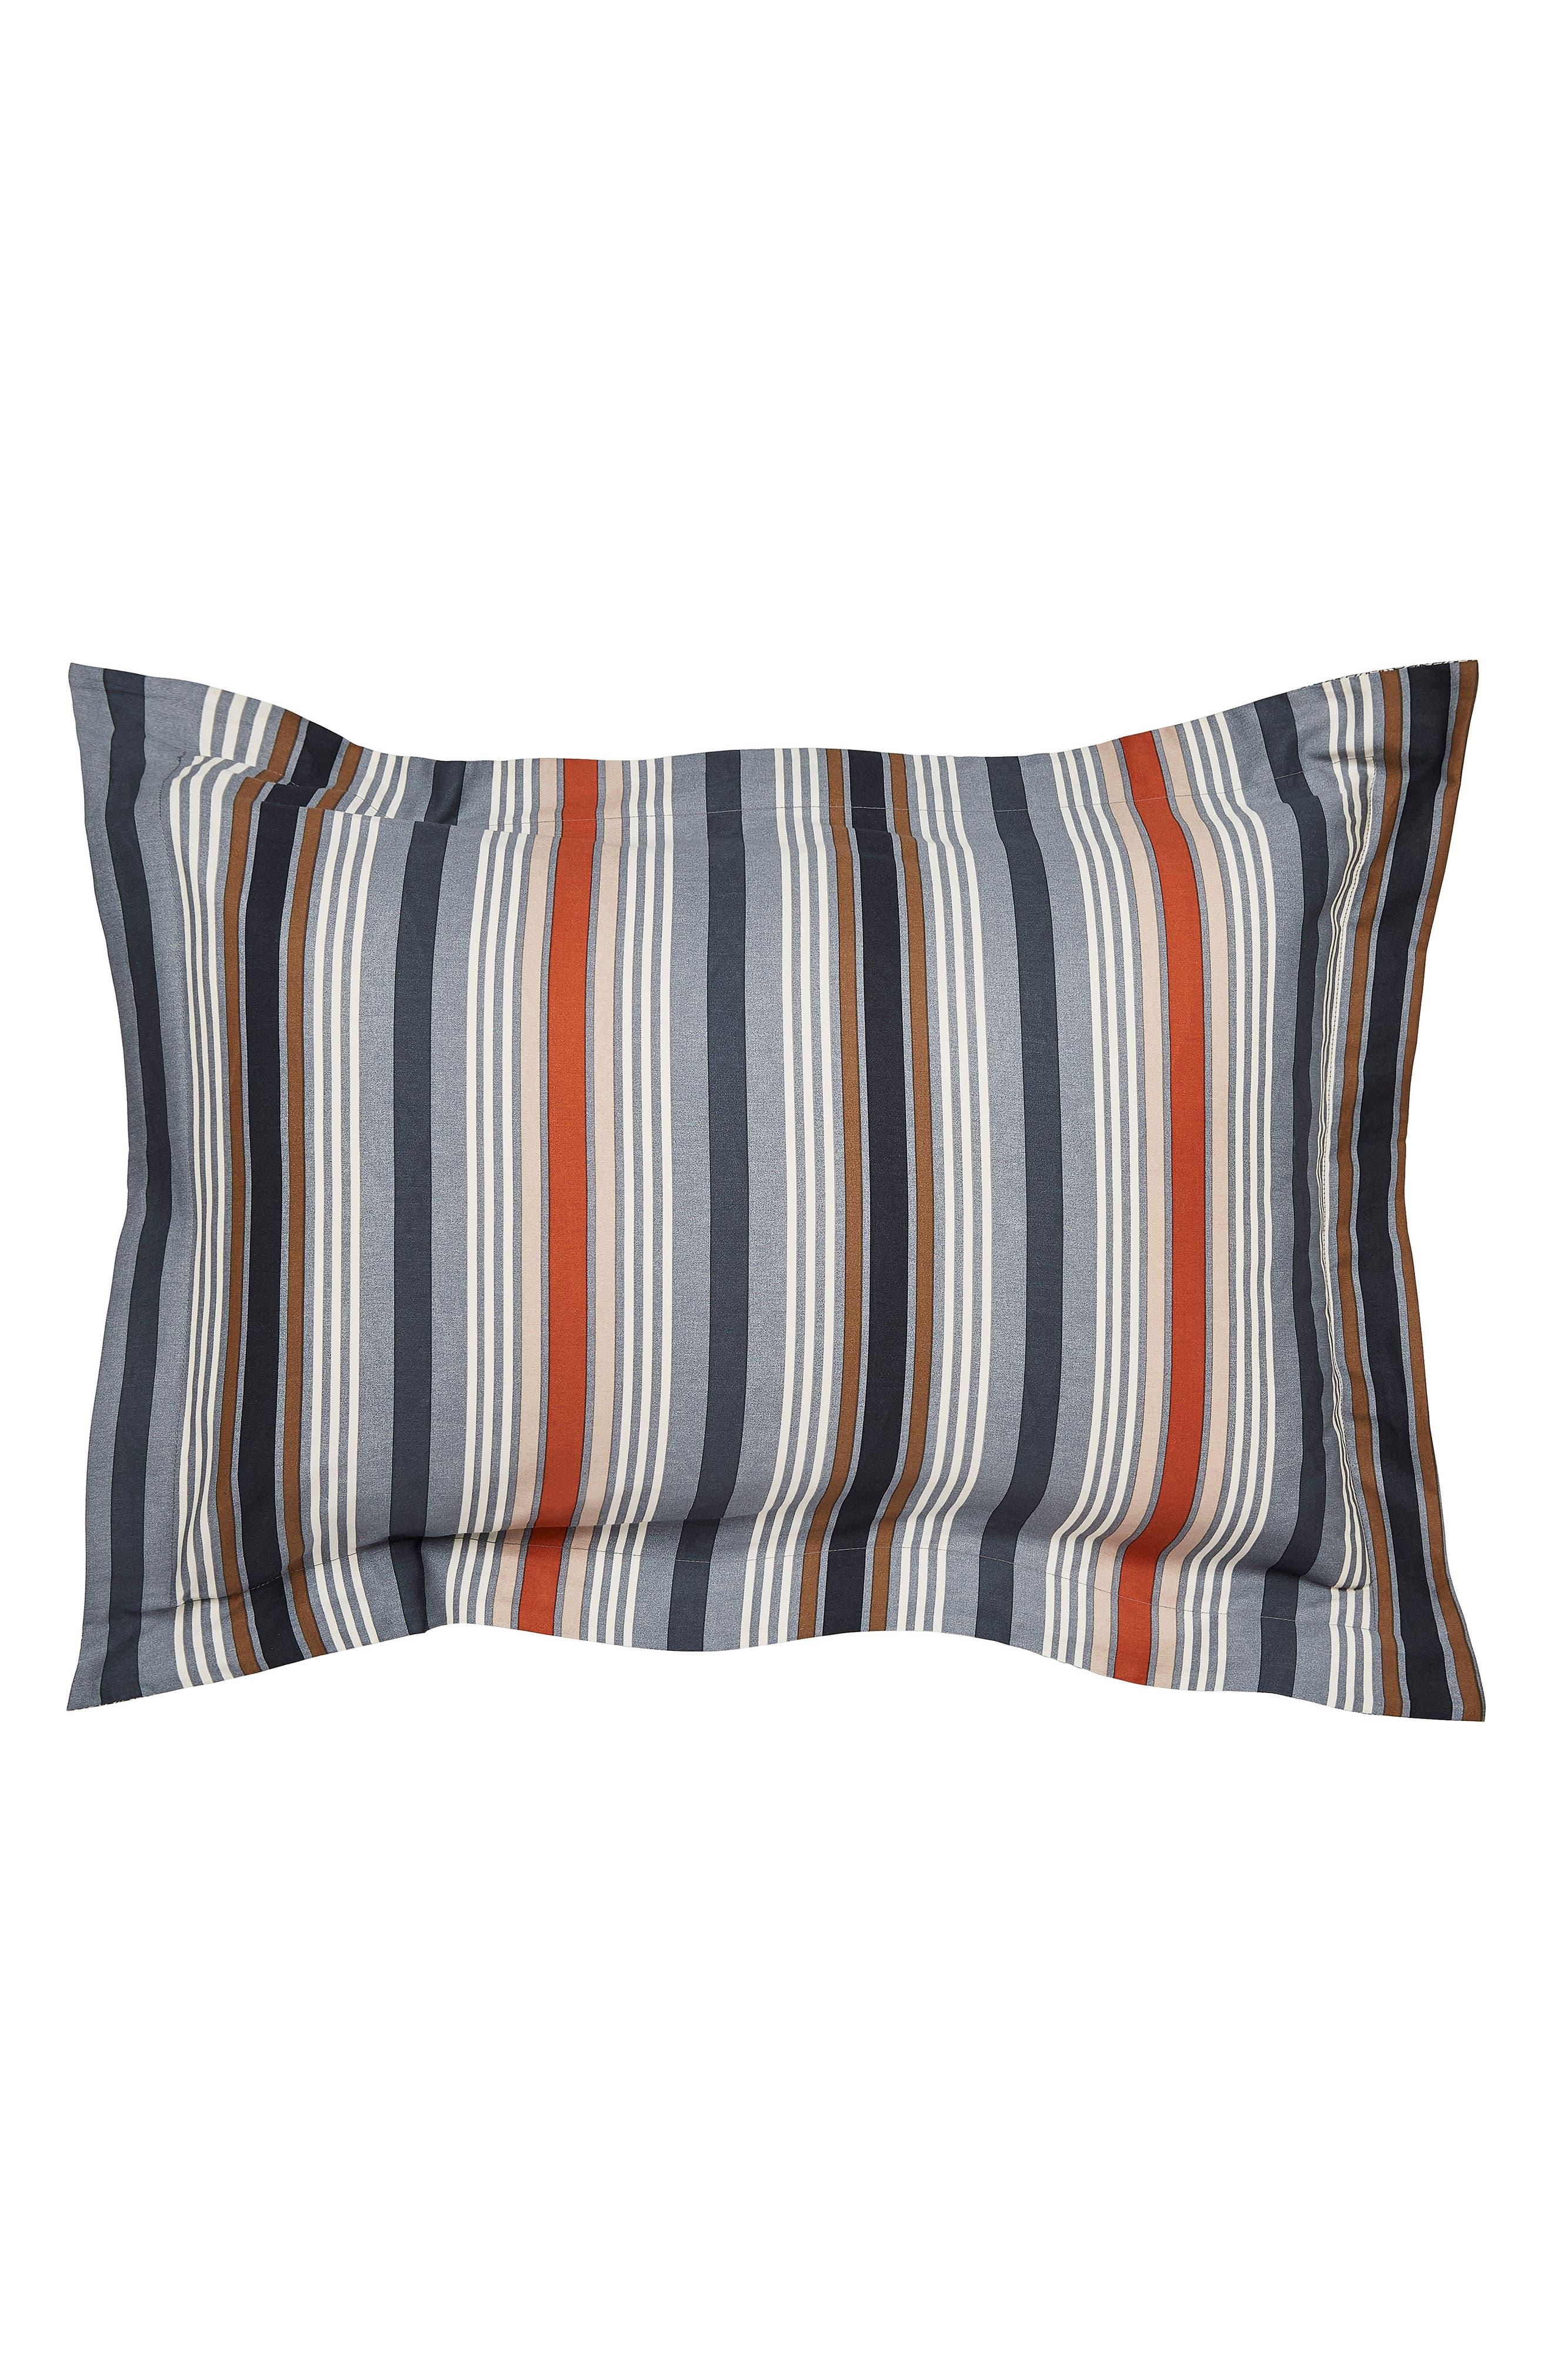 Alba Duvet Cover, Sham & Accent Pillow Set,                             Alternate thumbnail 5, color,                             Blue